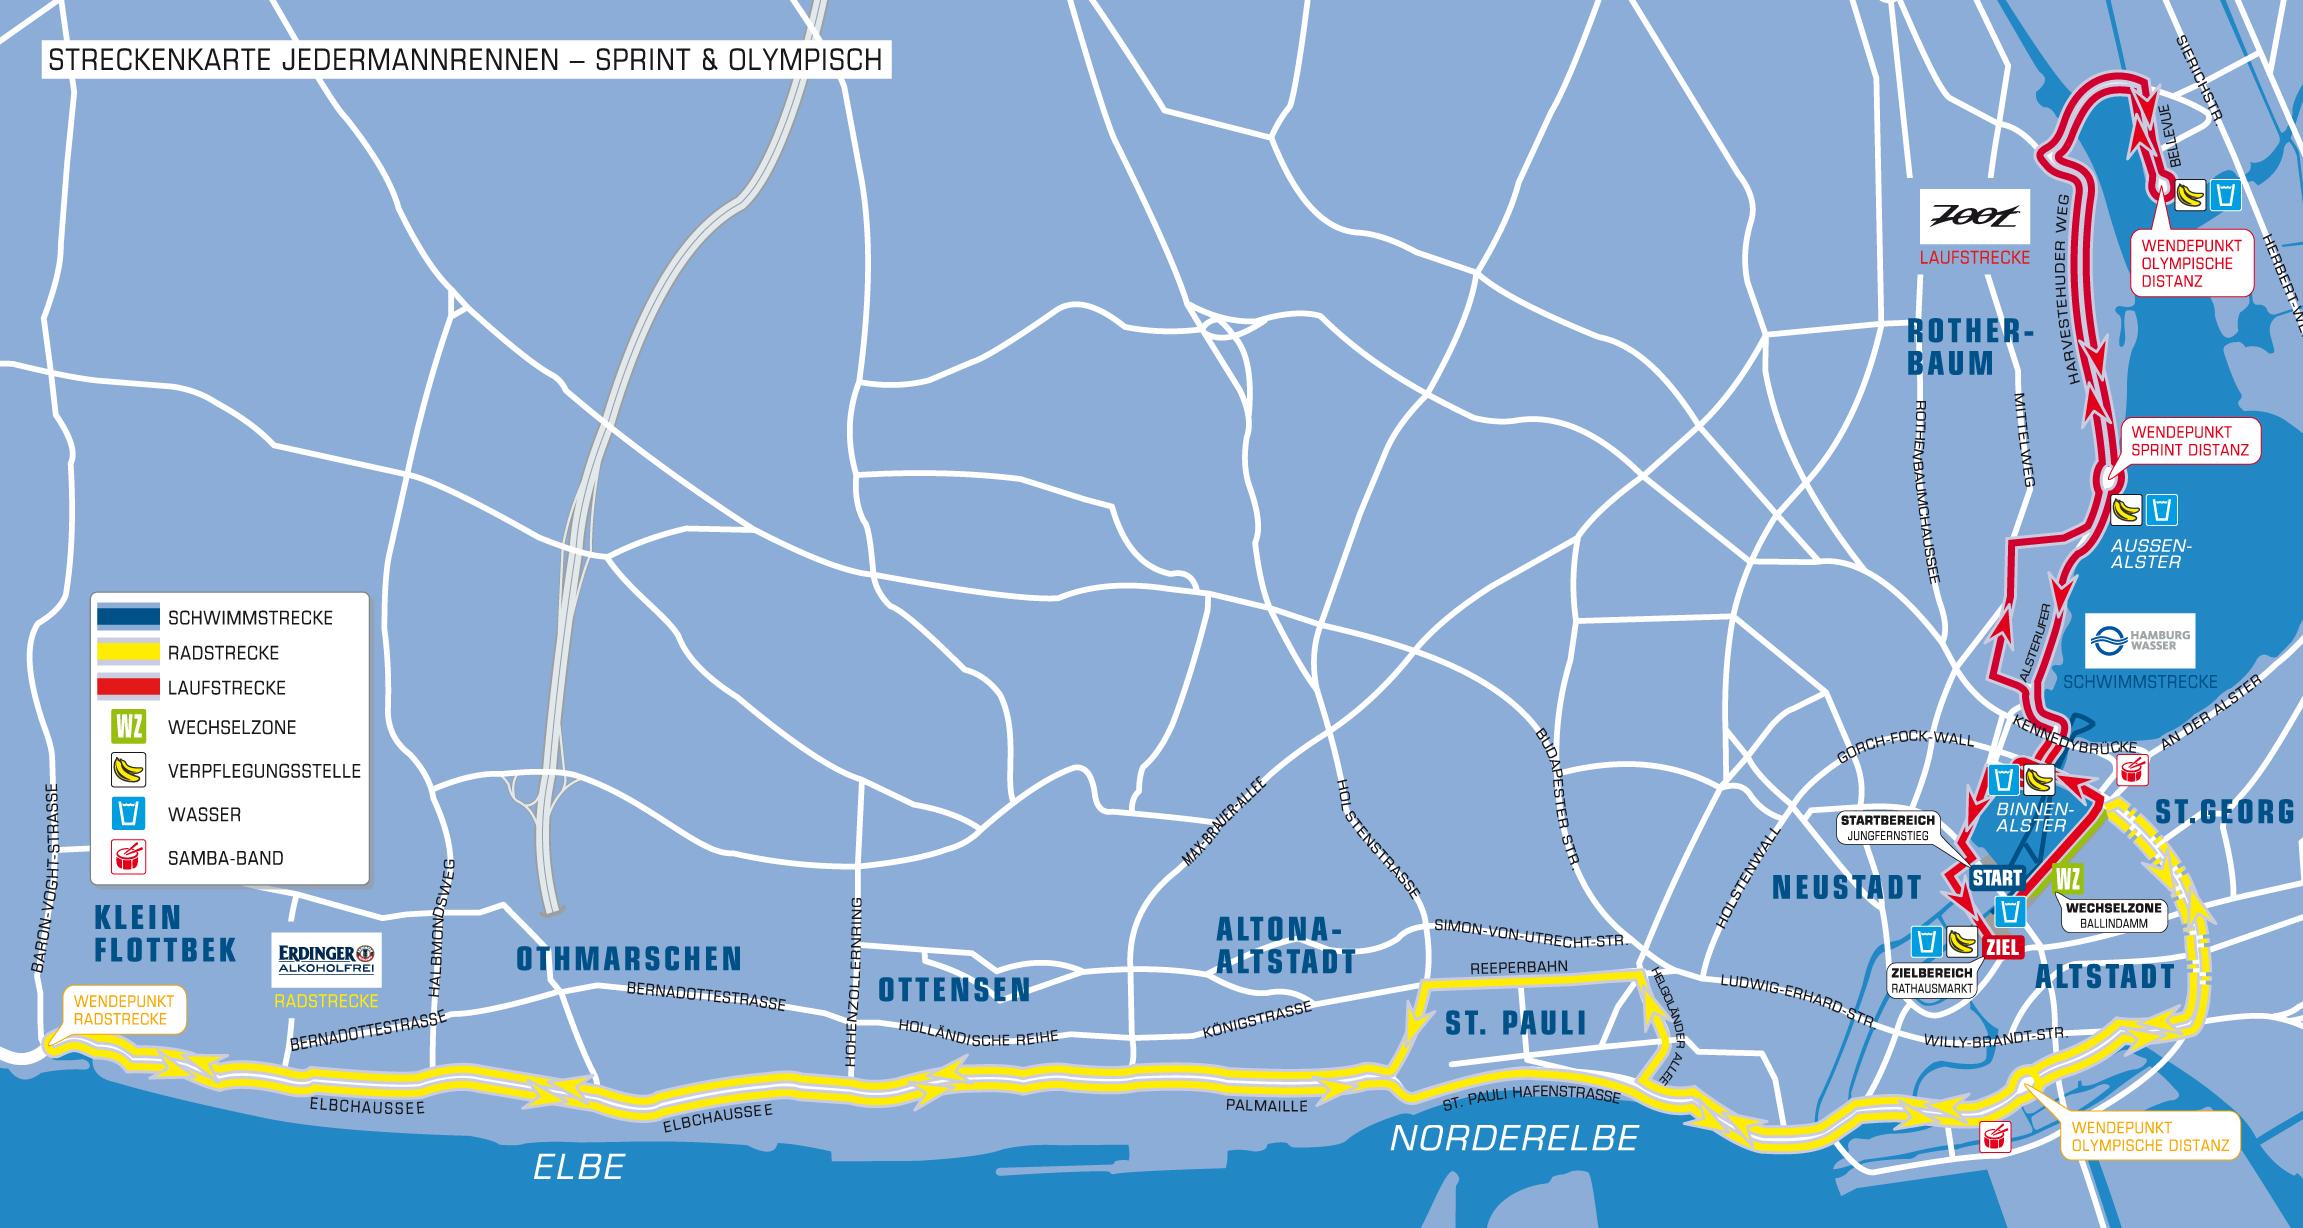 ... Hamburg ITU Triathlon Mixed Relay World williamhill coupon code 2015 williamhill tunisie Championships | Triathlon.org